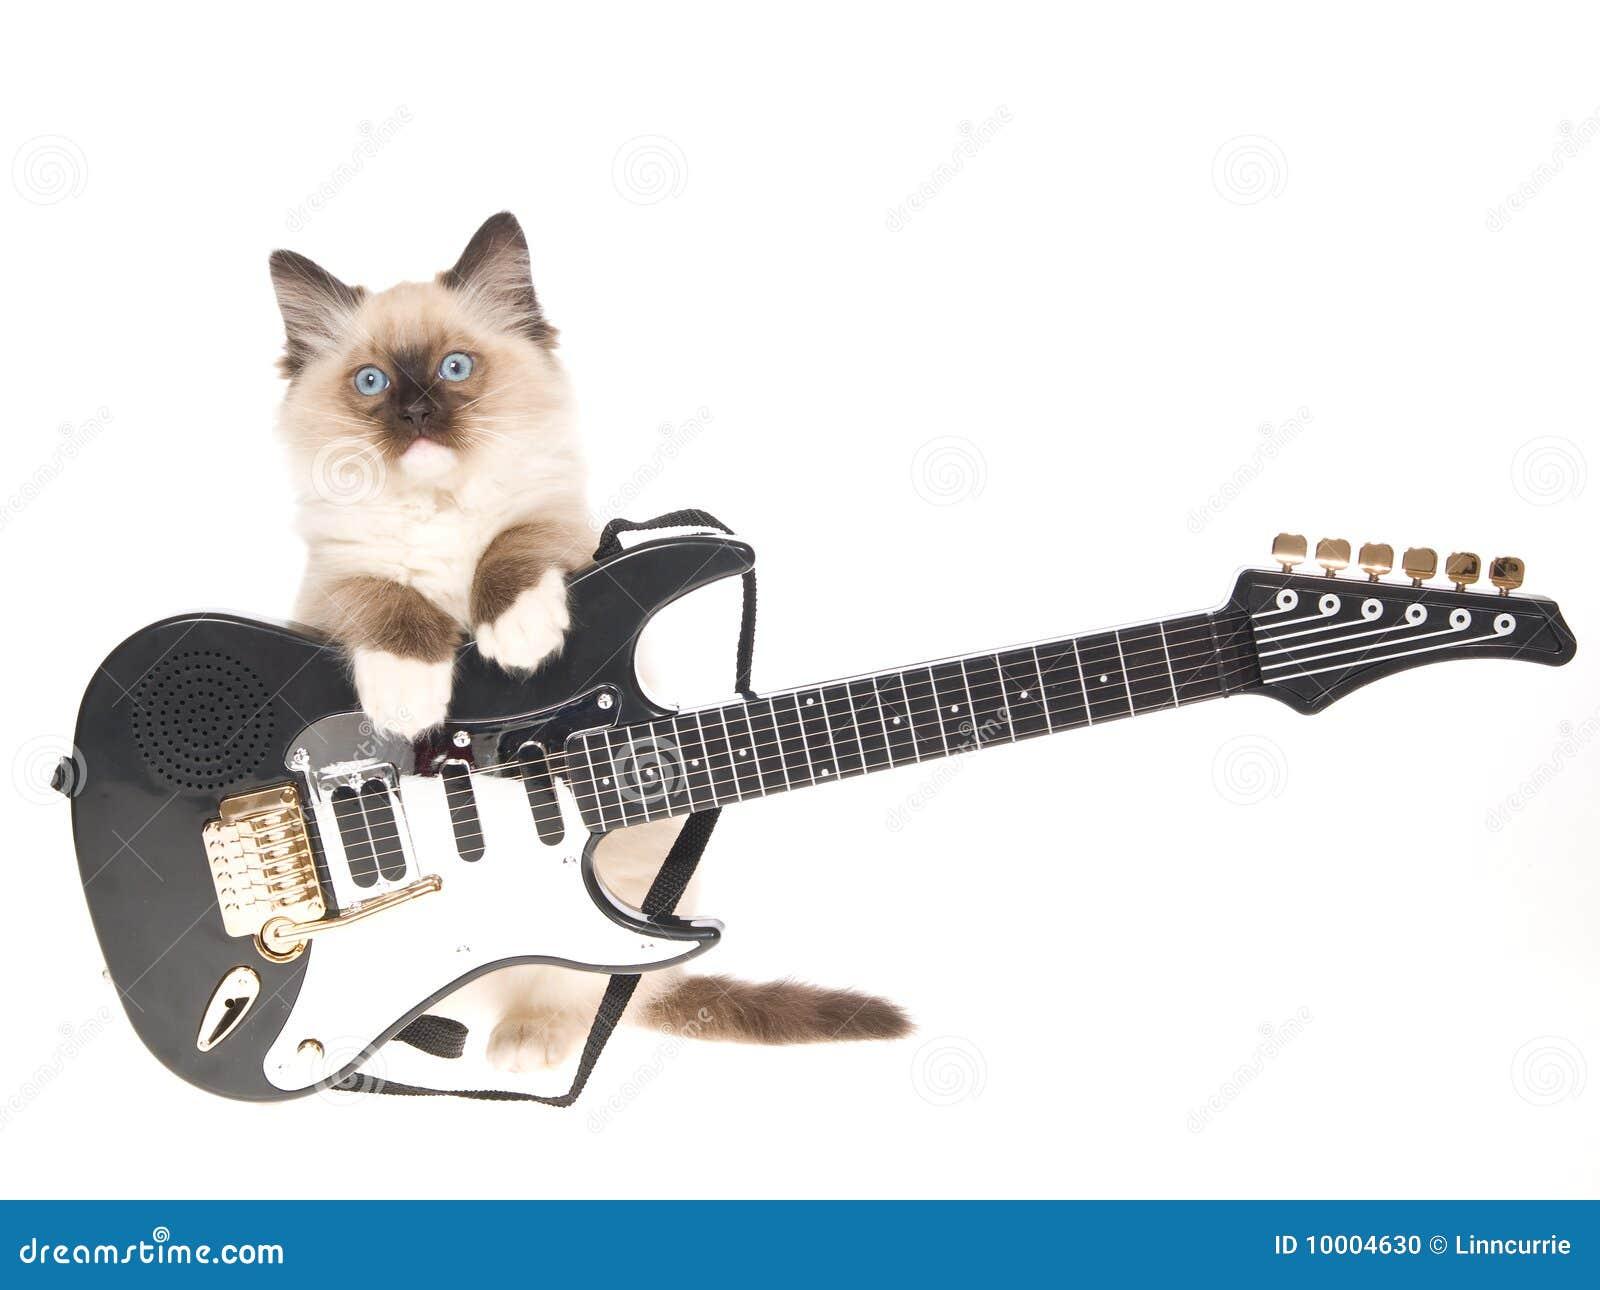 Ragdoll kitten with mini electric guitar